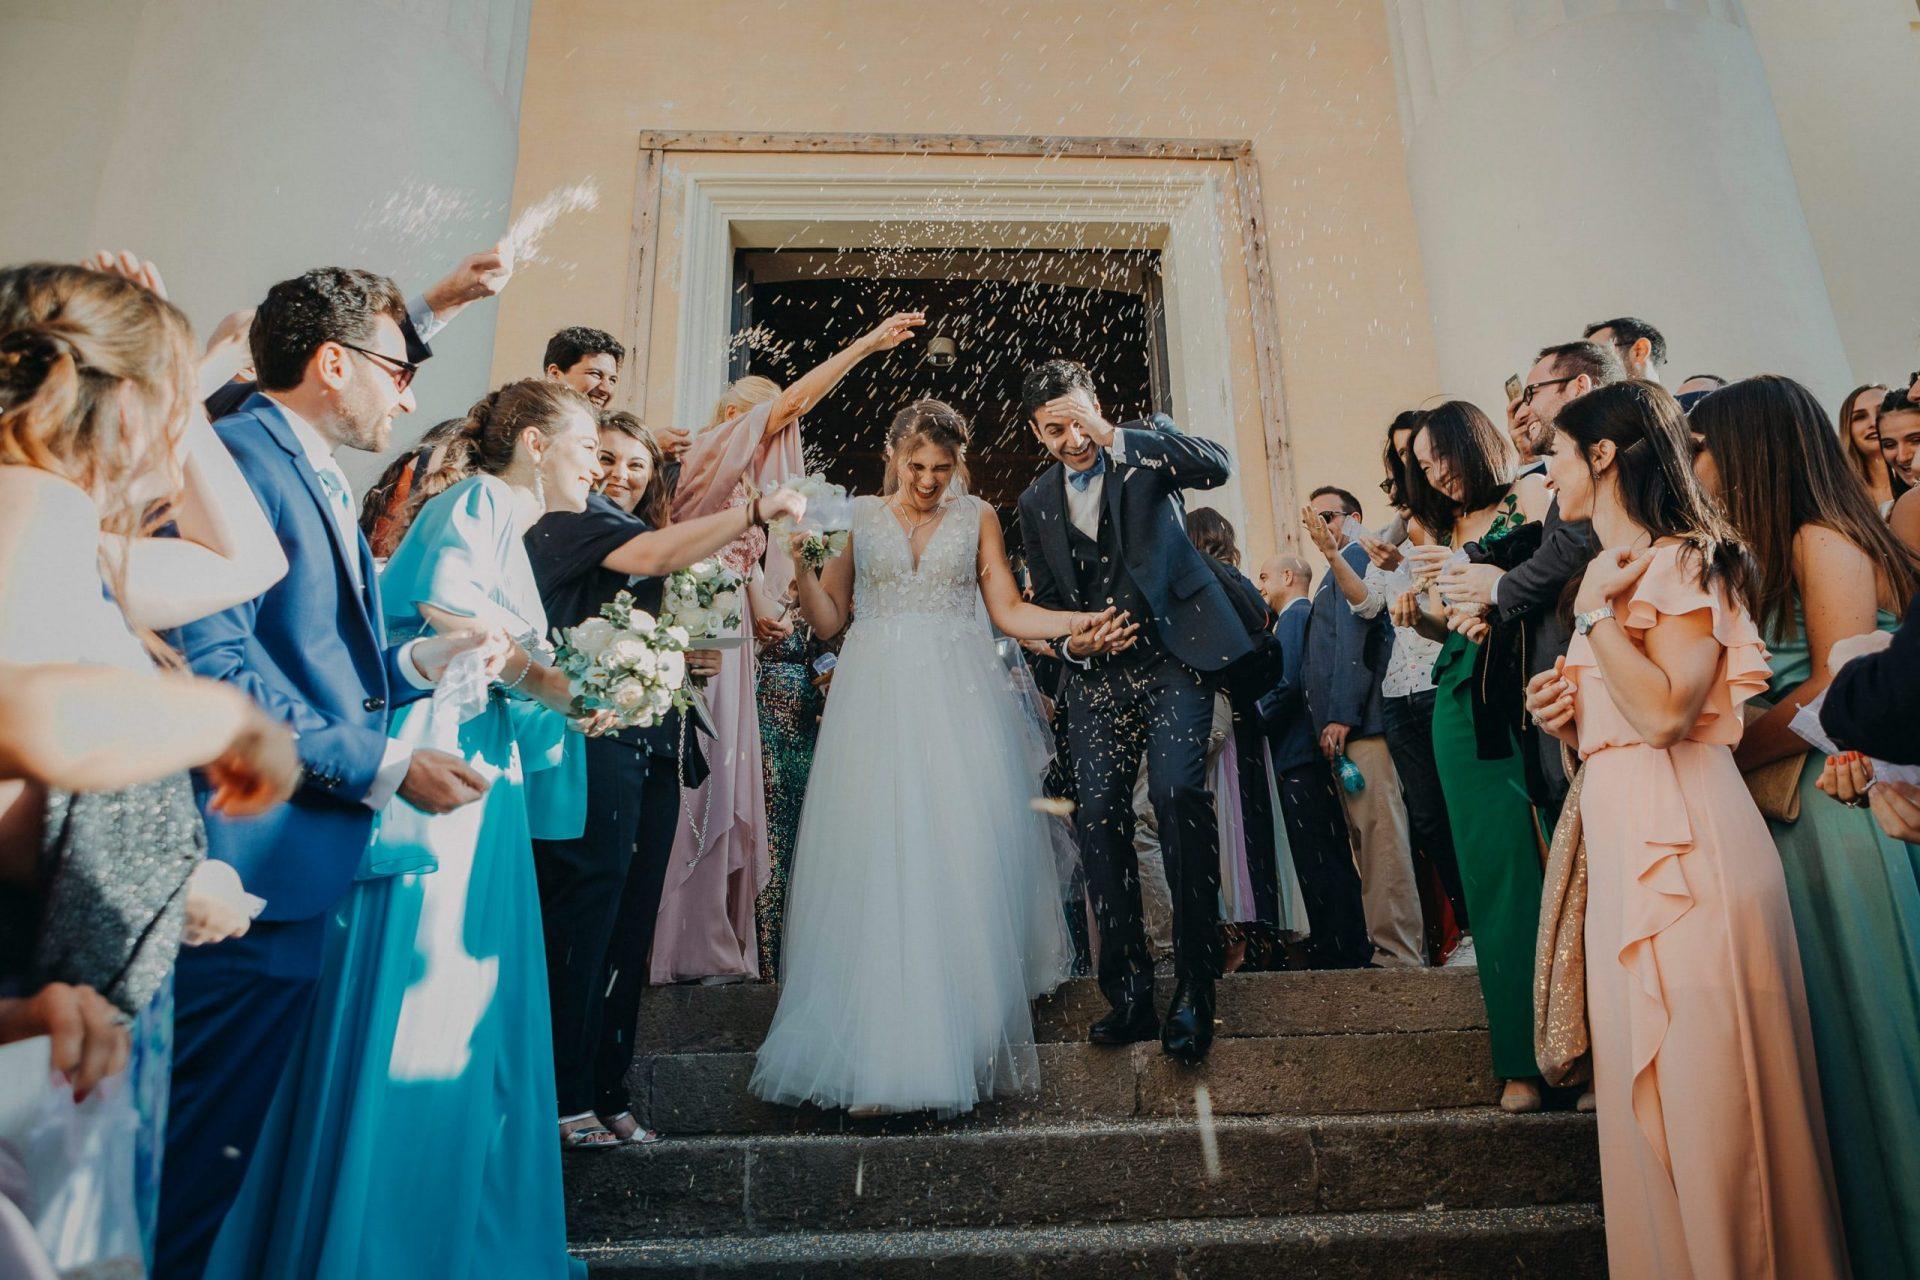 Simona and Elie, confetti launch